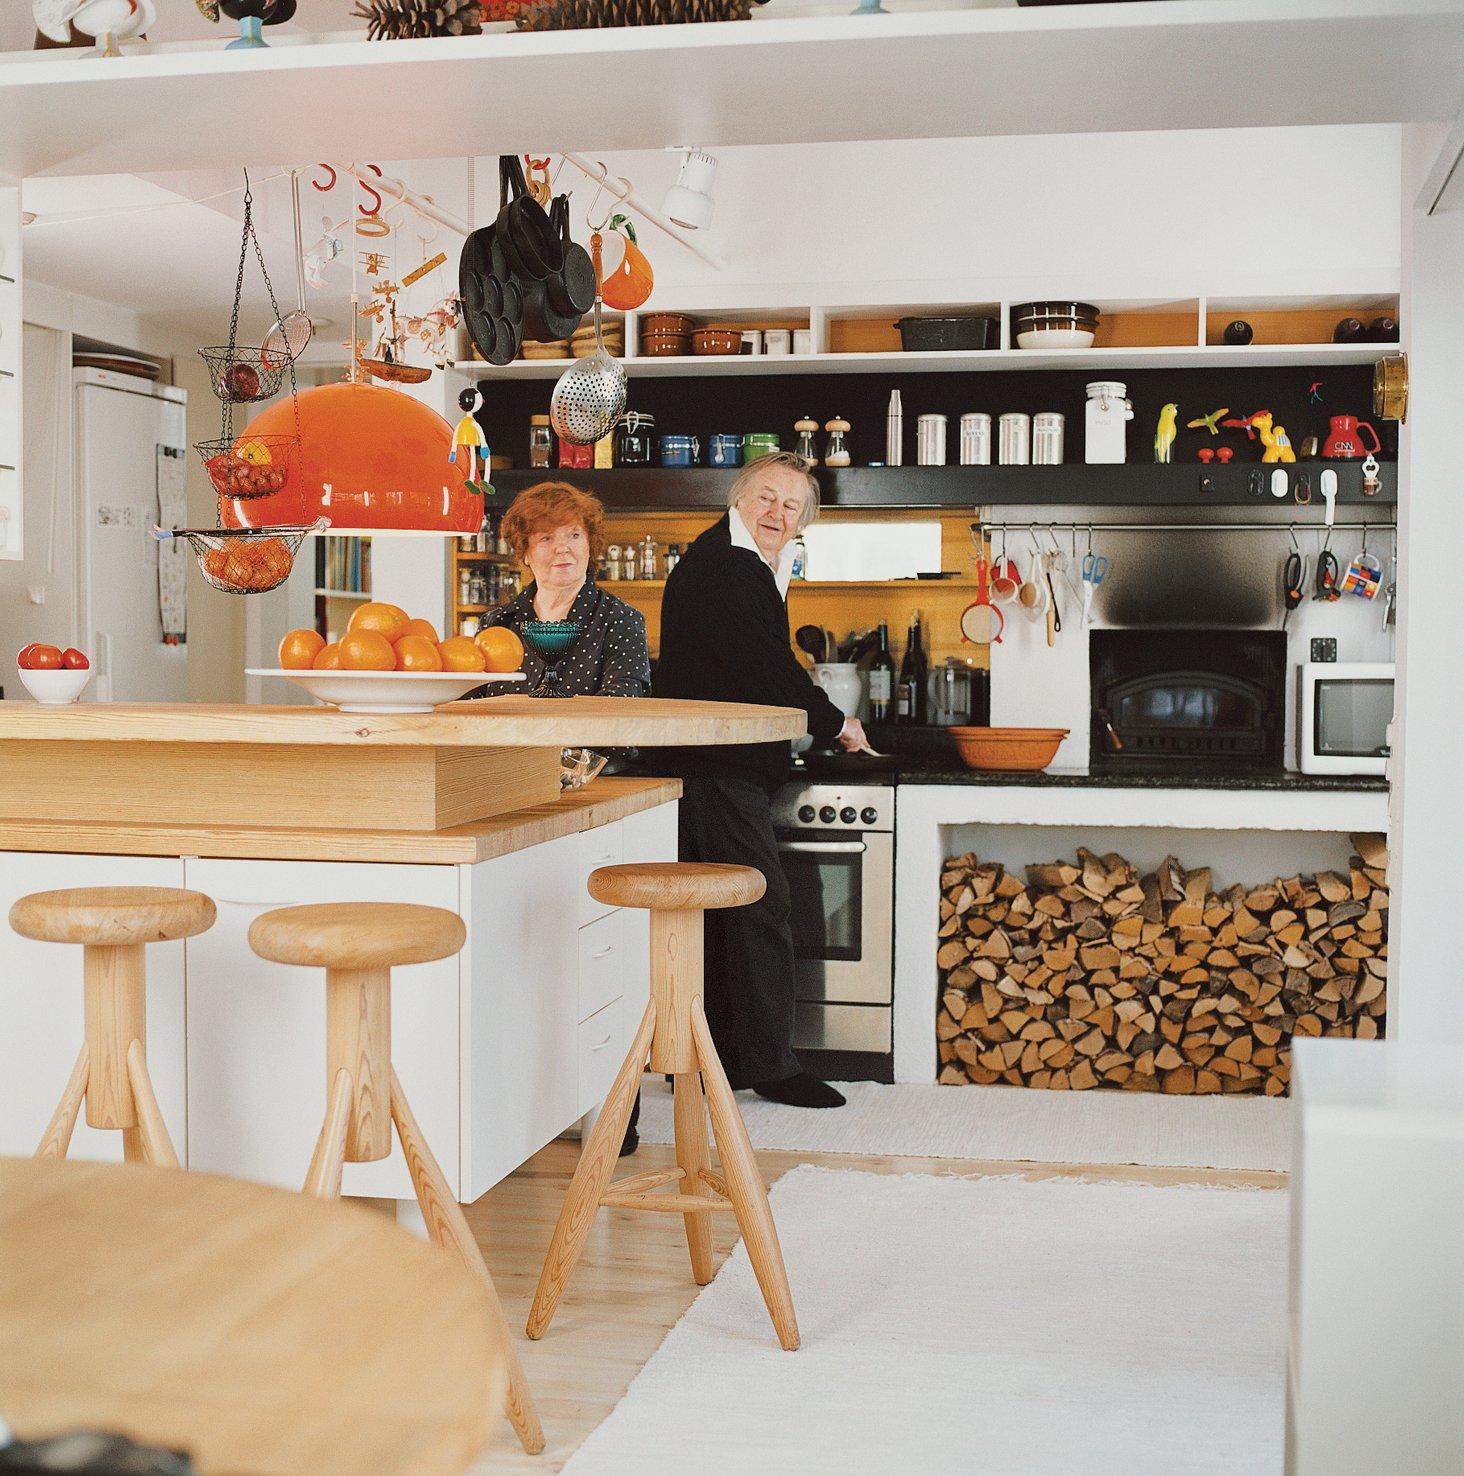 Eero and Pirkko Aarnio, in their home's kitchen, have been married for over 50 years.  Photo 12 of 13 in Furniture Designer Focus: Eero Aarnio